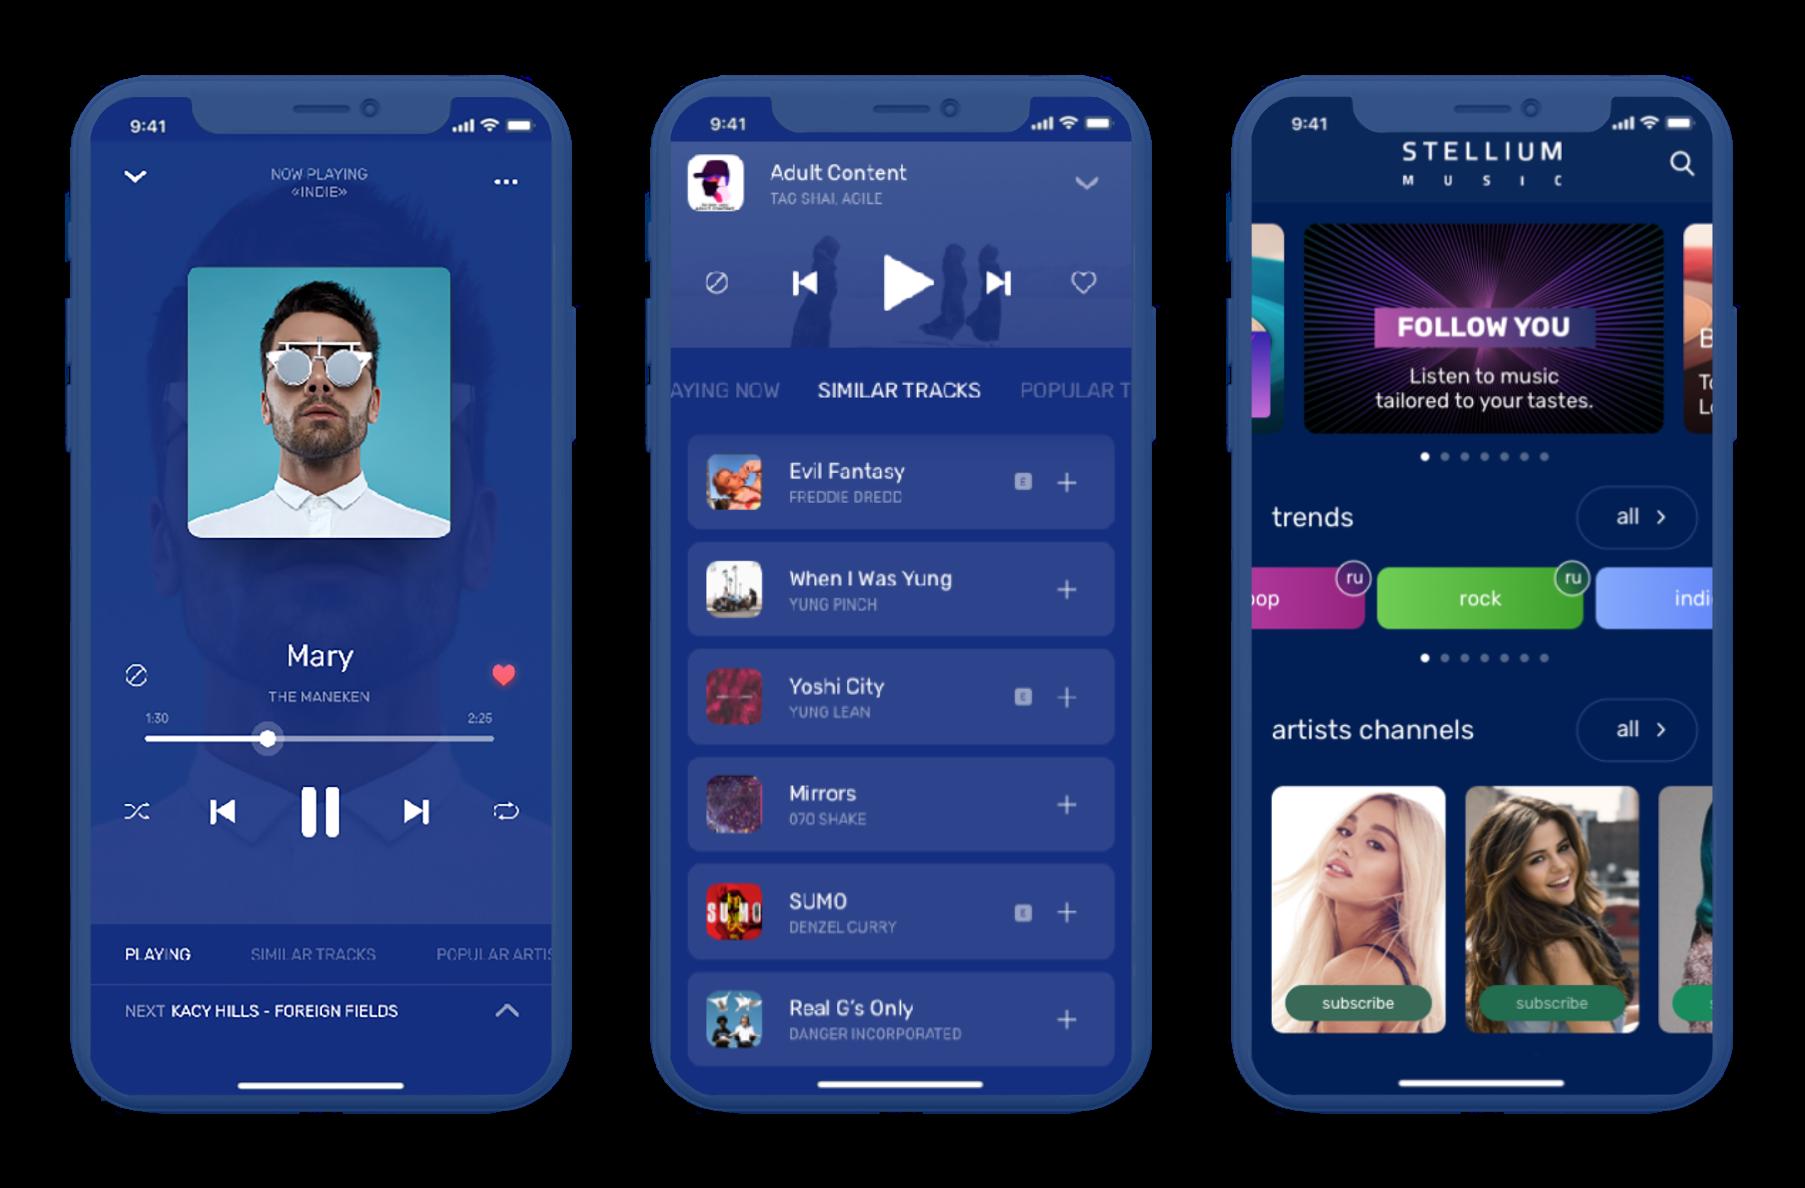 STELLIUM streaming app